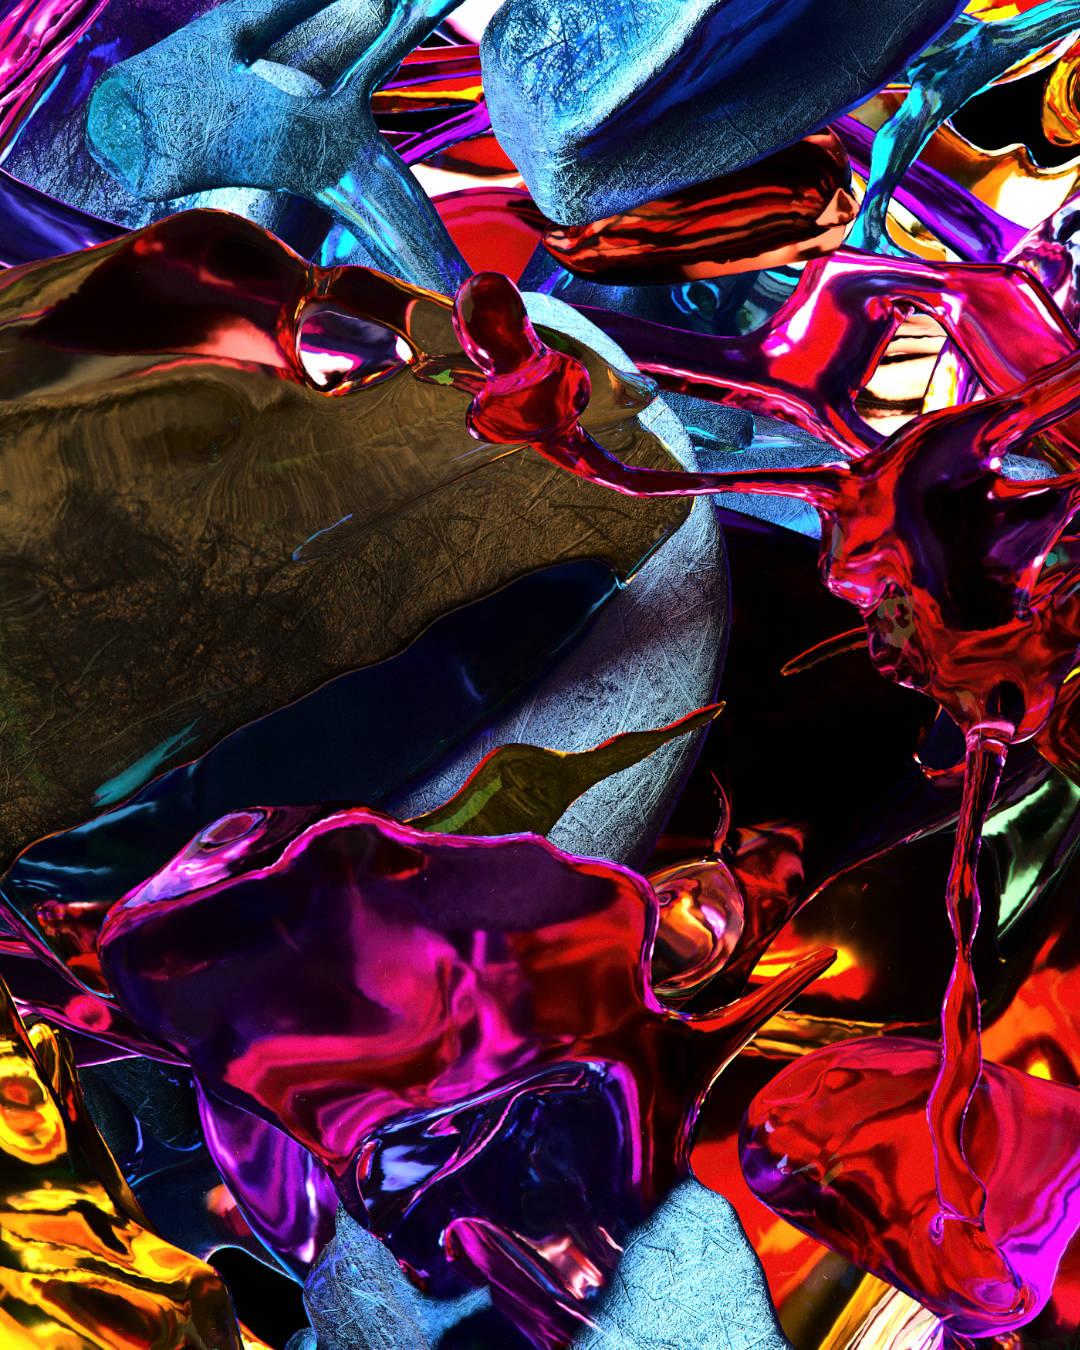 fakenewstudio_x_danny_ivan_synthetic_fossils_09